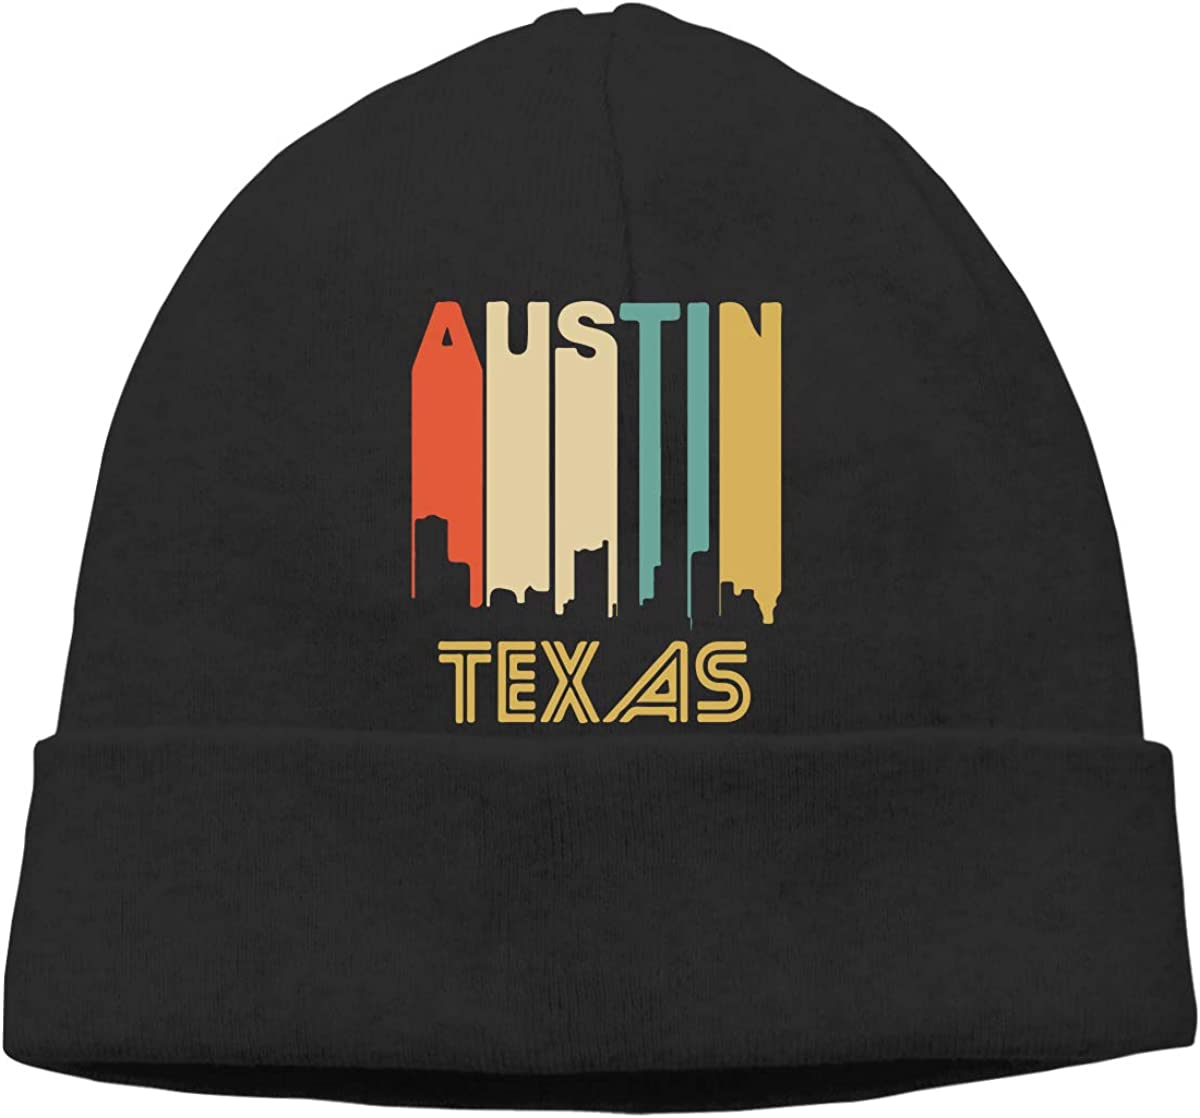 COLLJL8 Unisex Retro 1970s Style Austin Texas Skyline Outdoor Warm Beanies Hat Soft Winter Skull Caps